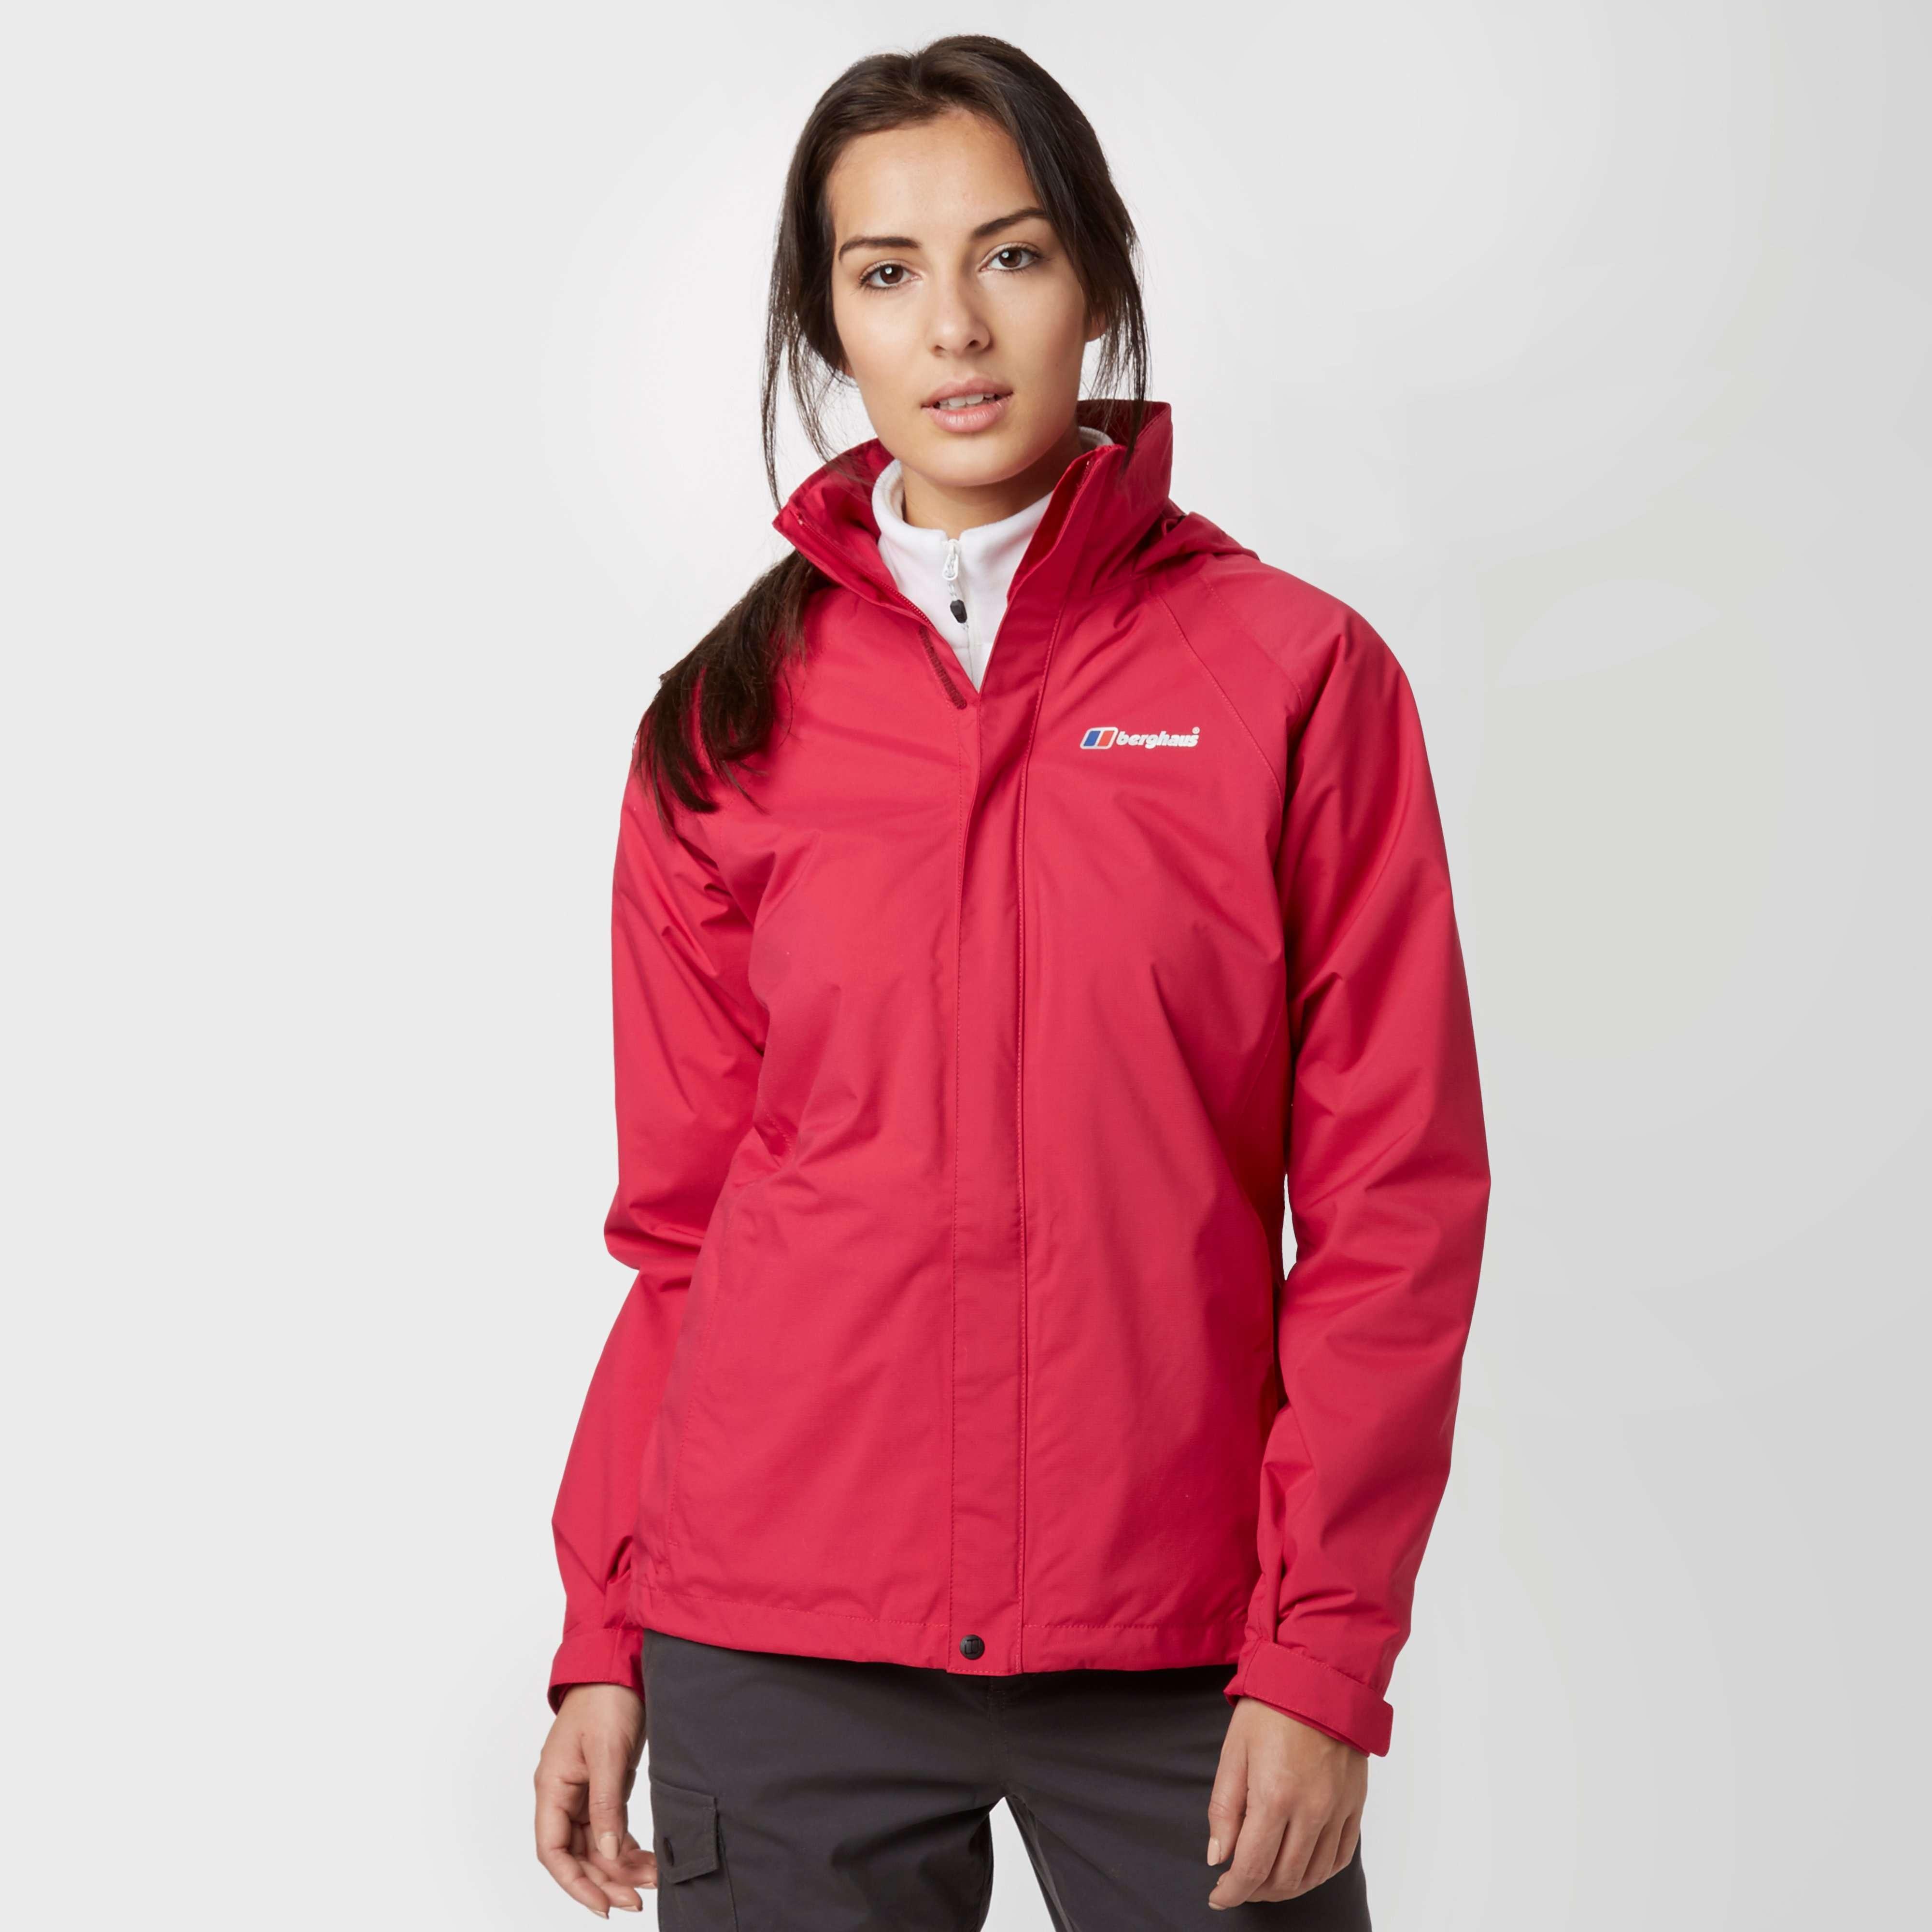 BERGHAUS Women's Calisto Waterproof Jacket